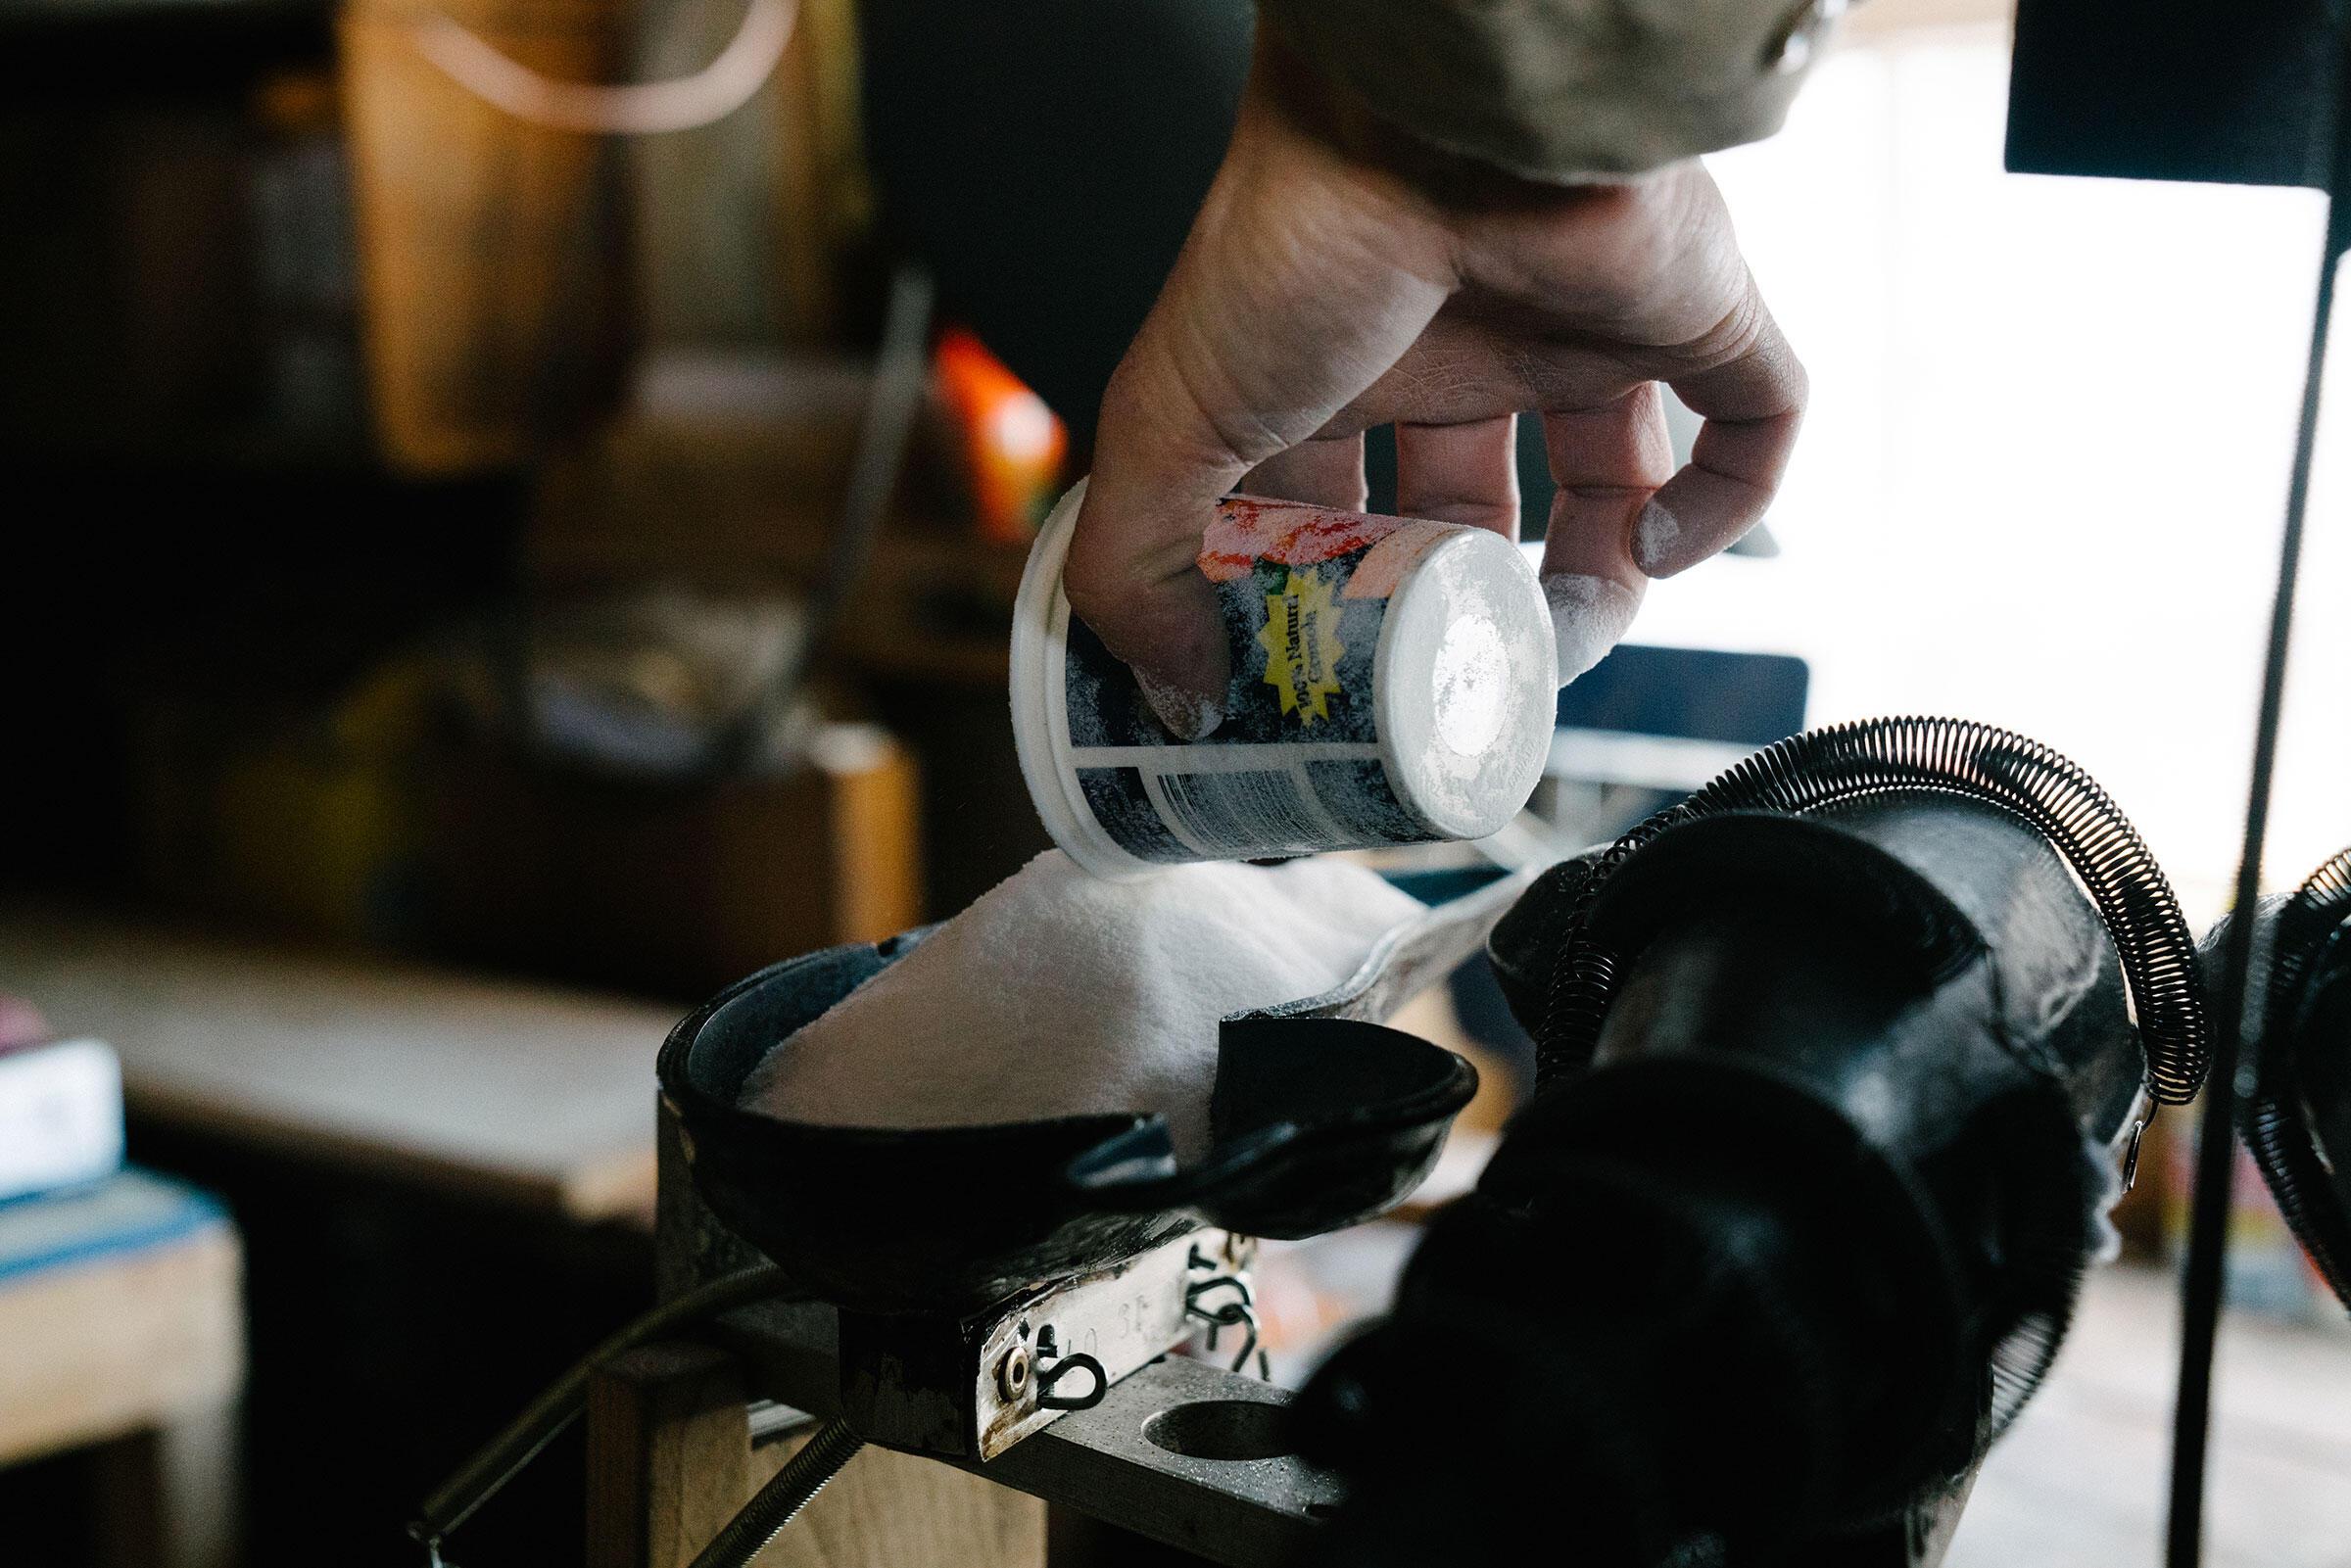 Snyder fills a decoy mold with powered polyethylene. Tristan Spinski